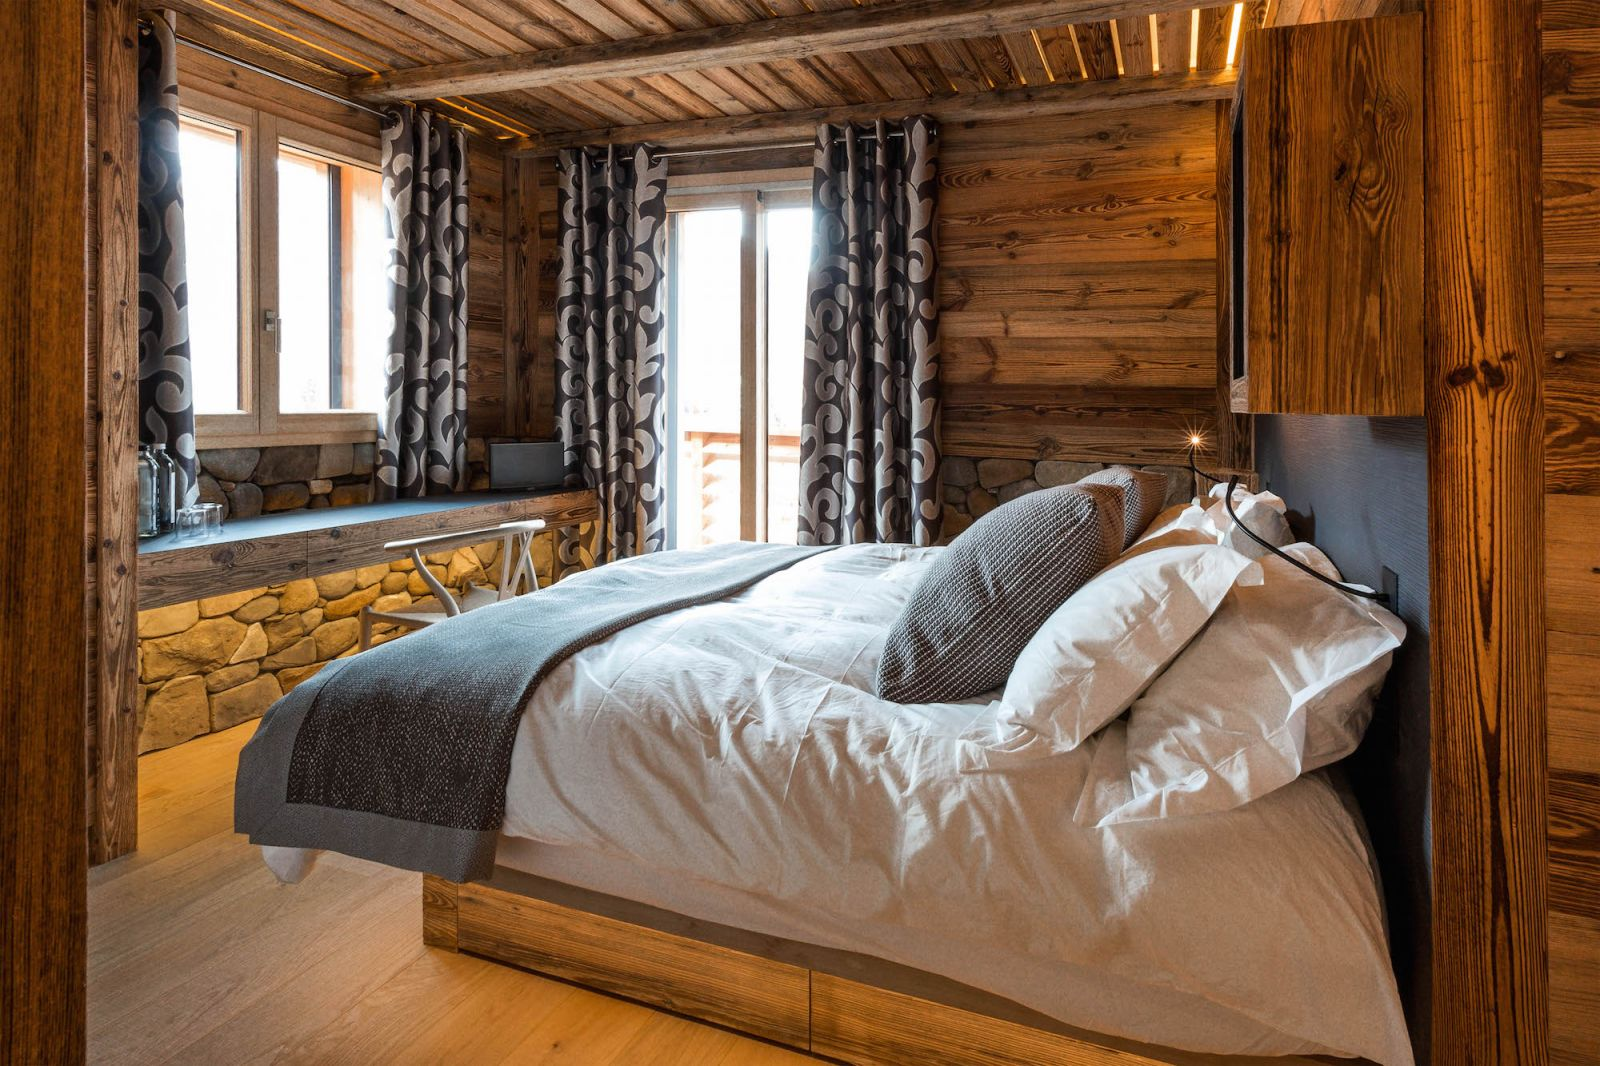 Serre Chevalier Luxury Chalet Rentals ski slopes indoor pool spa